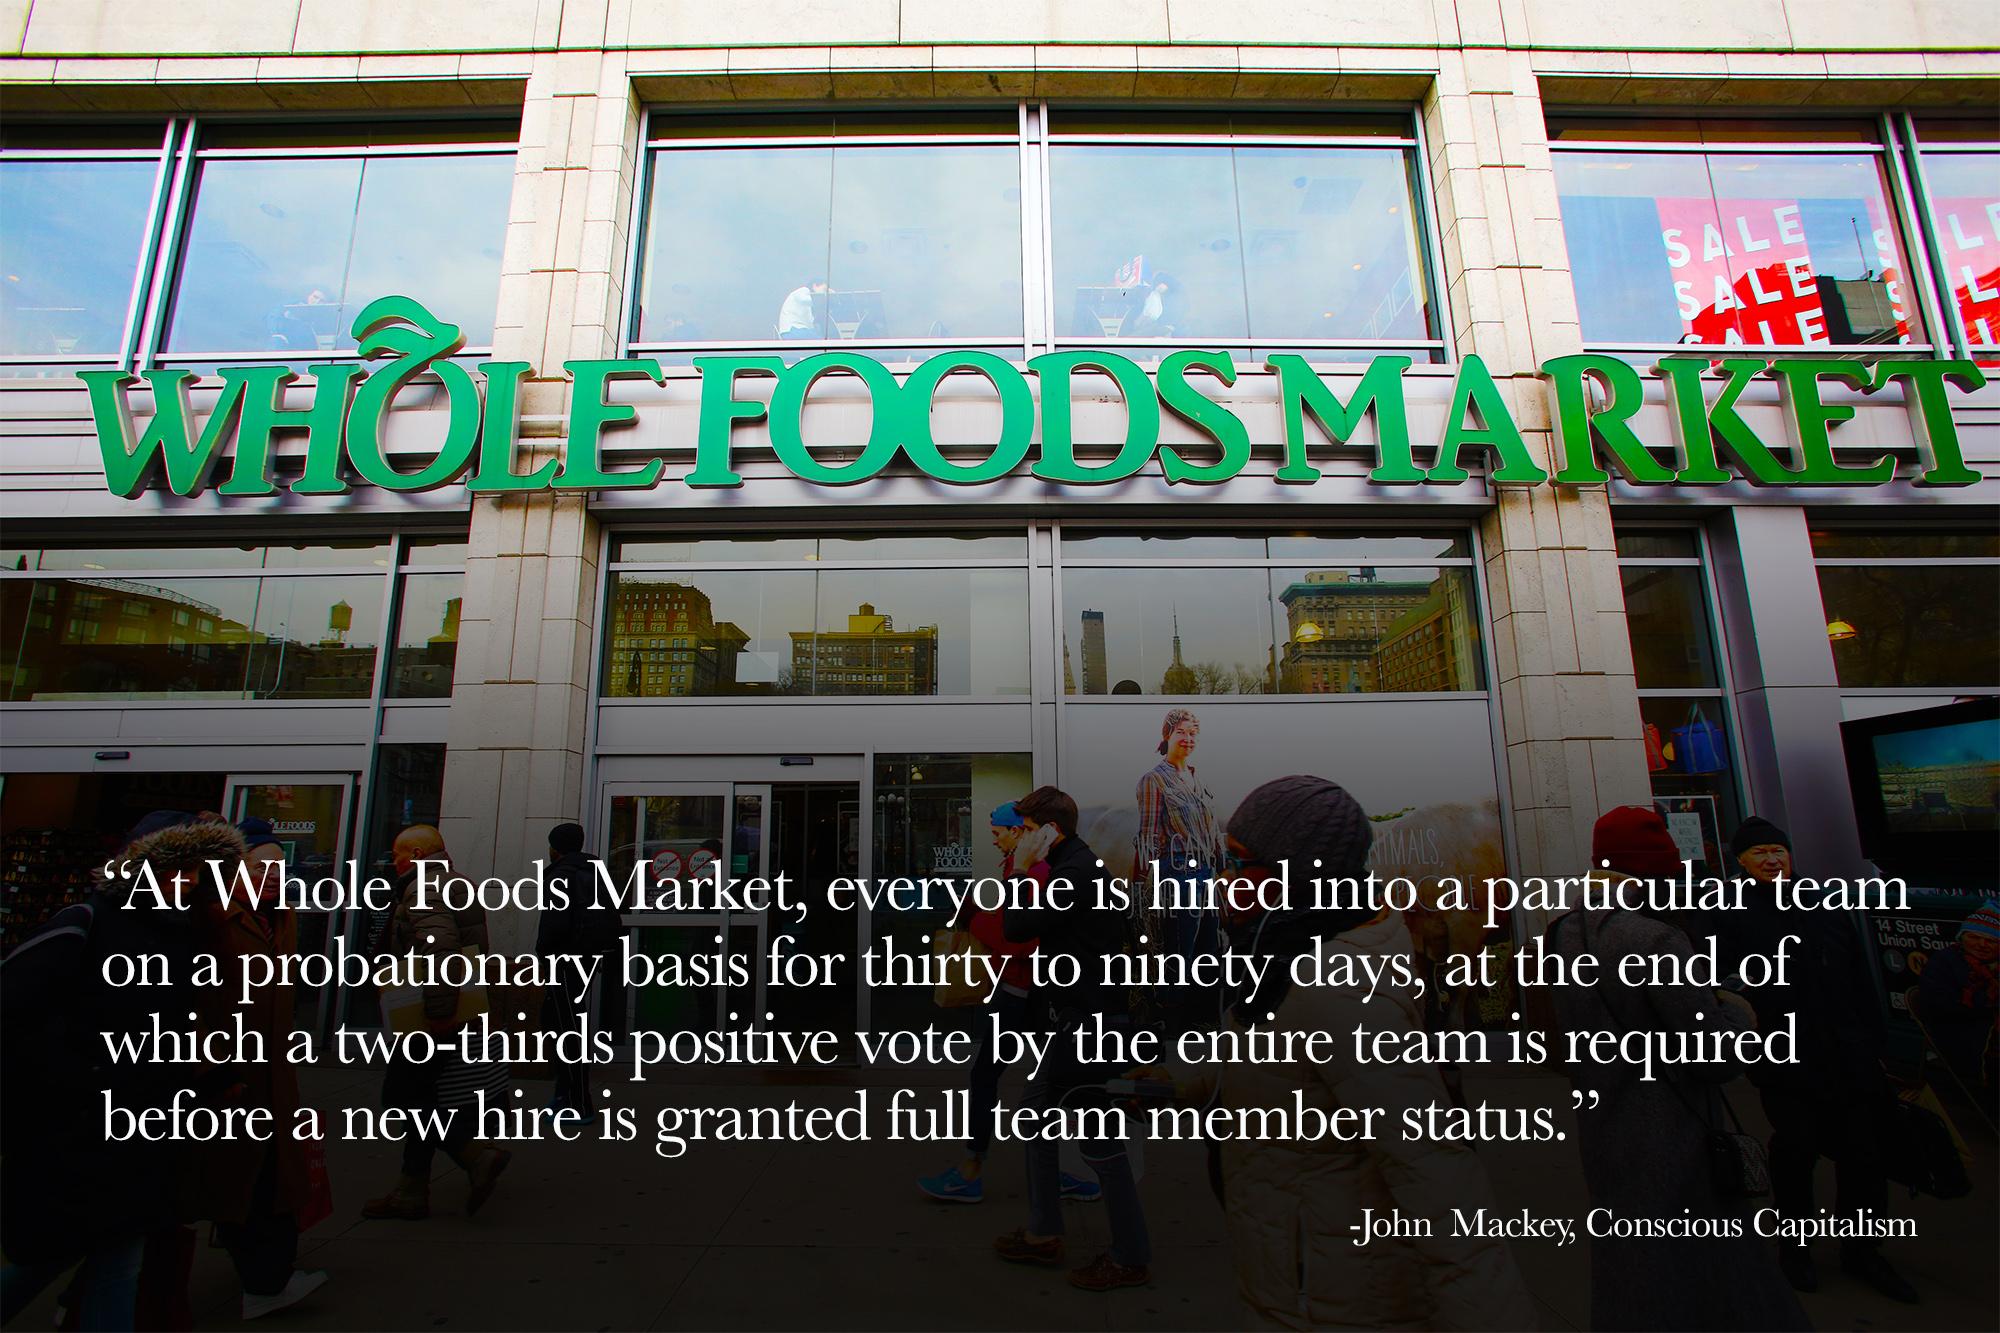 John Mackey-Conscious Capitalism